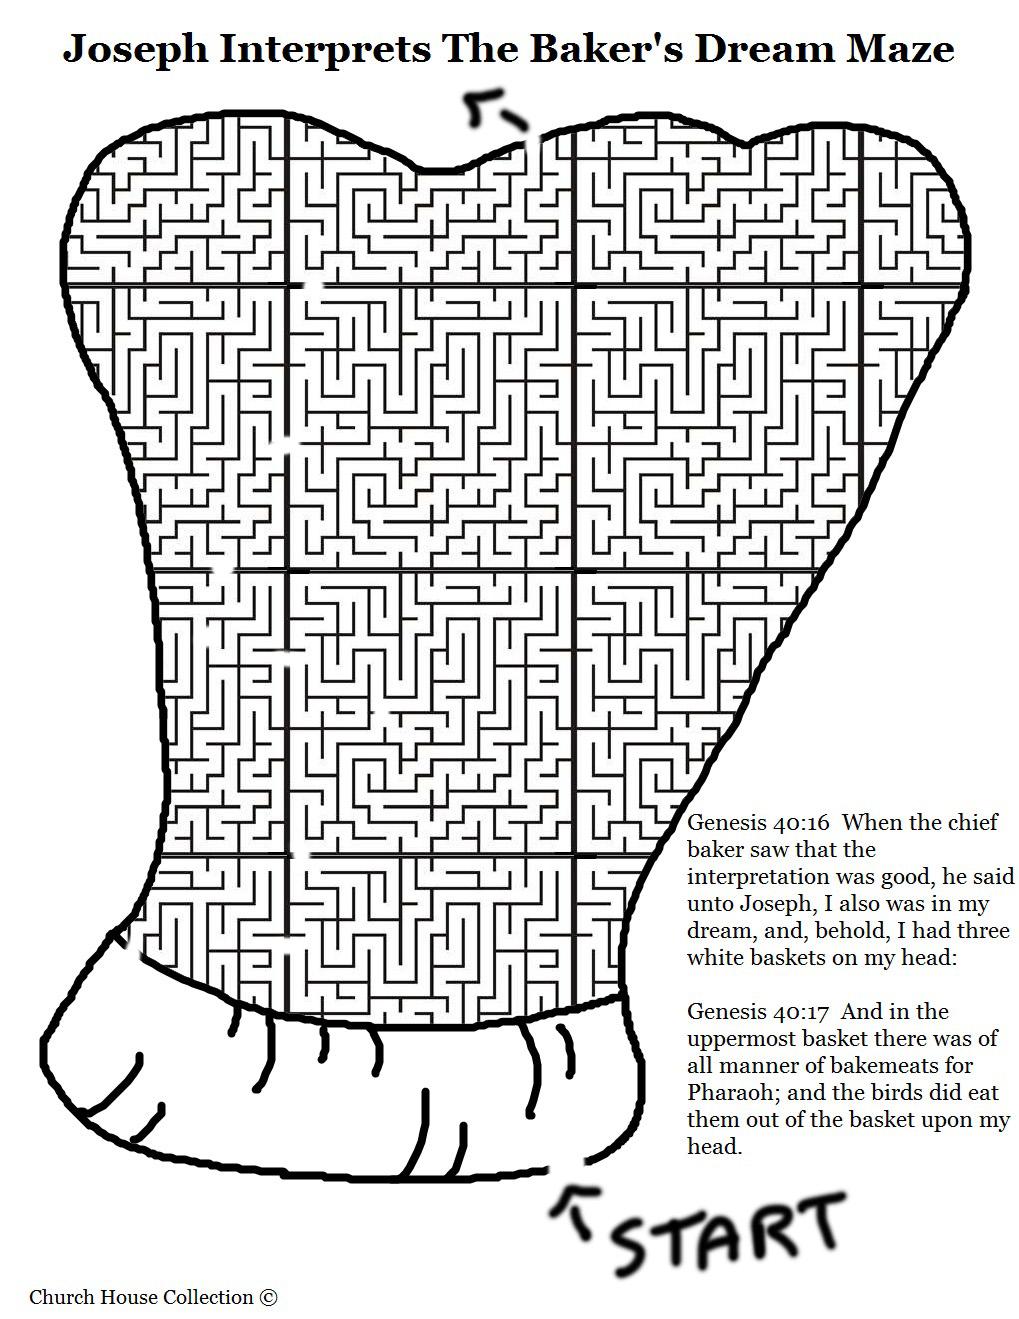 Joseph Interprets The Baker's Dream Hat Maze